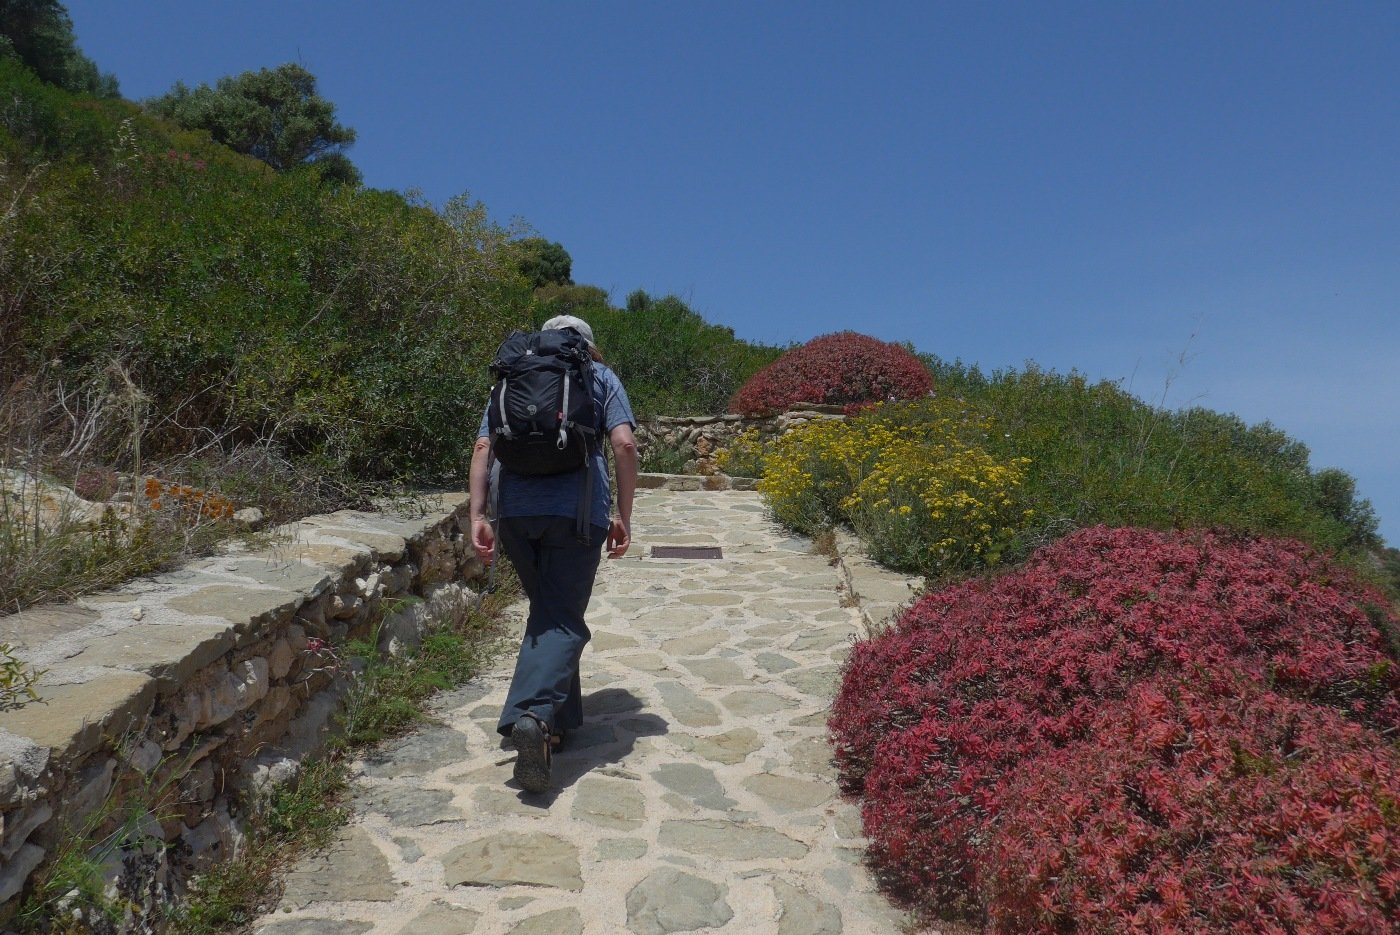 Salendo sul bel sentiero lastricato, fra le euforbie fiorite